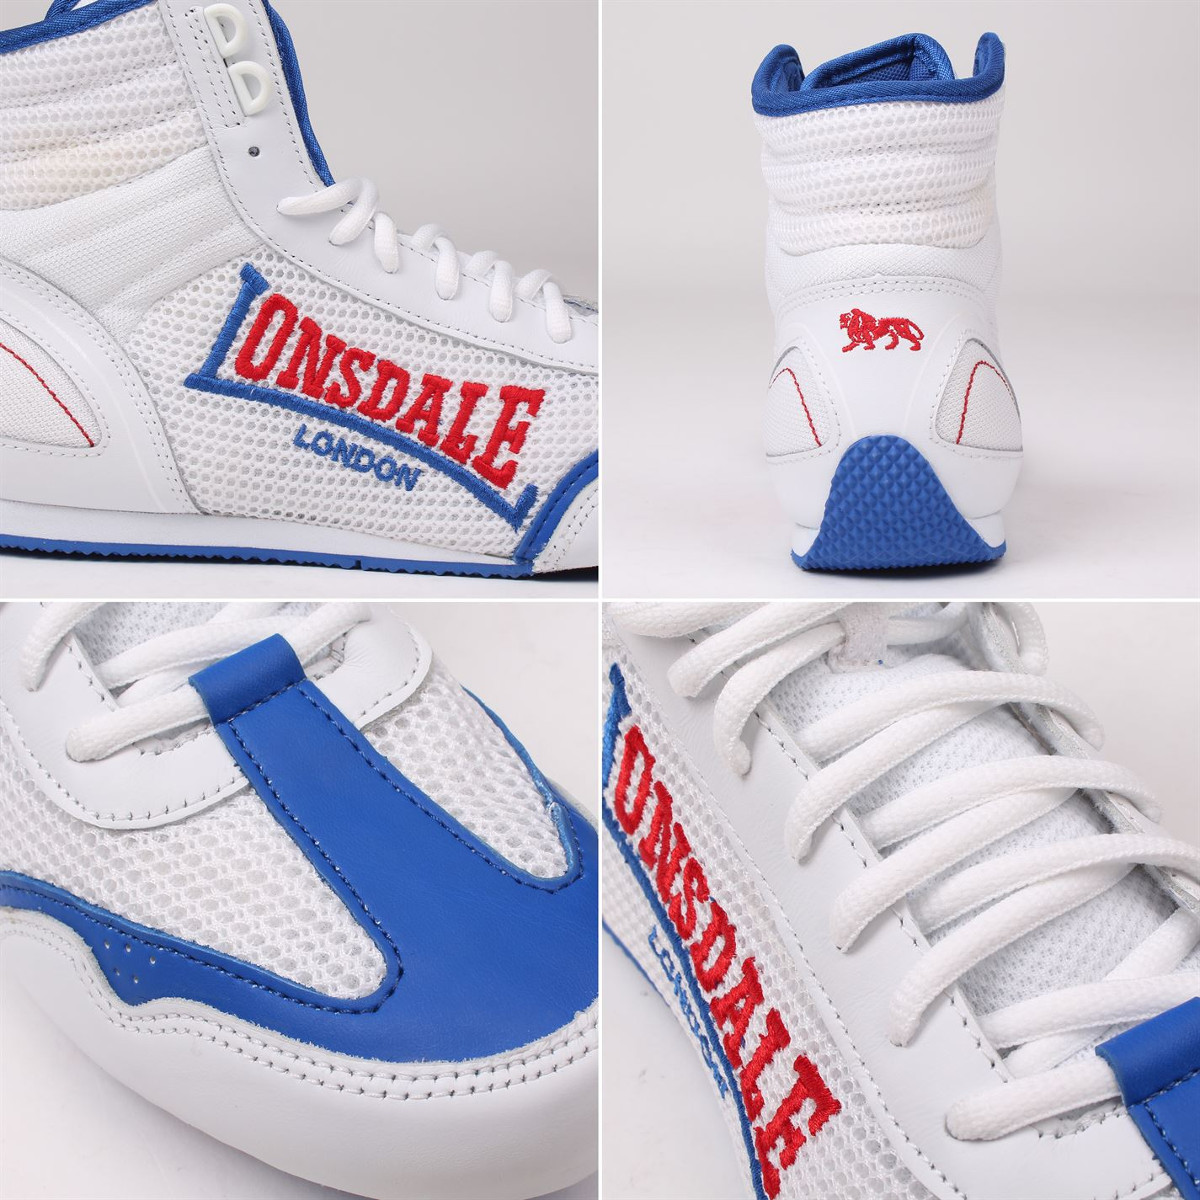 LONSDALE Men's Contender Boxing Boots